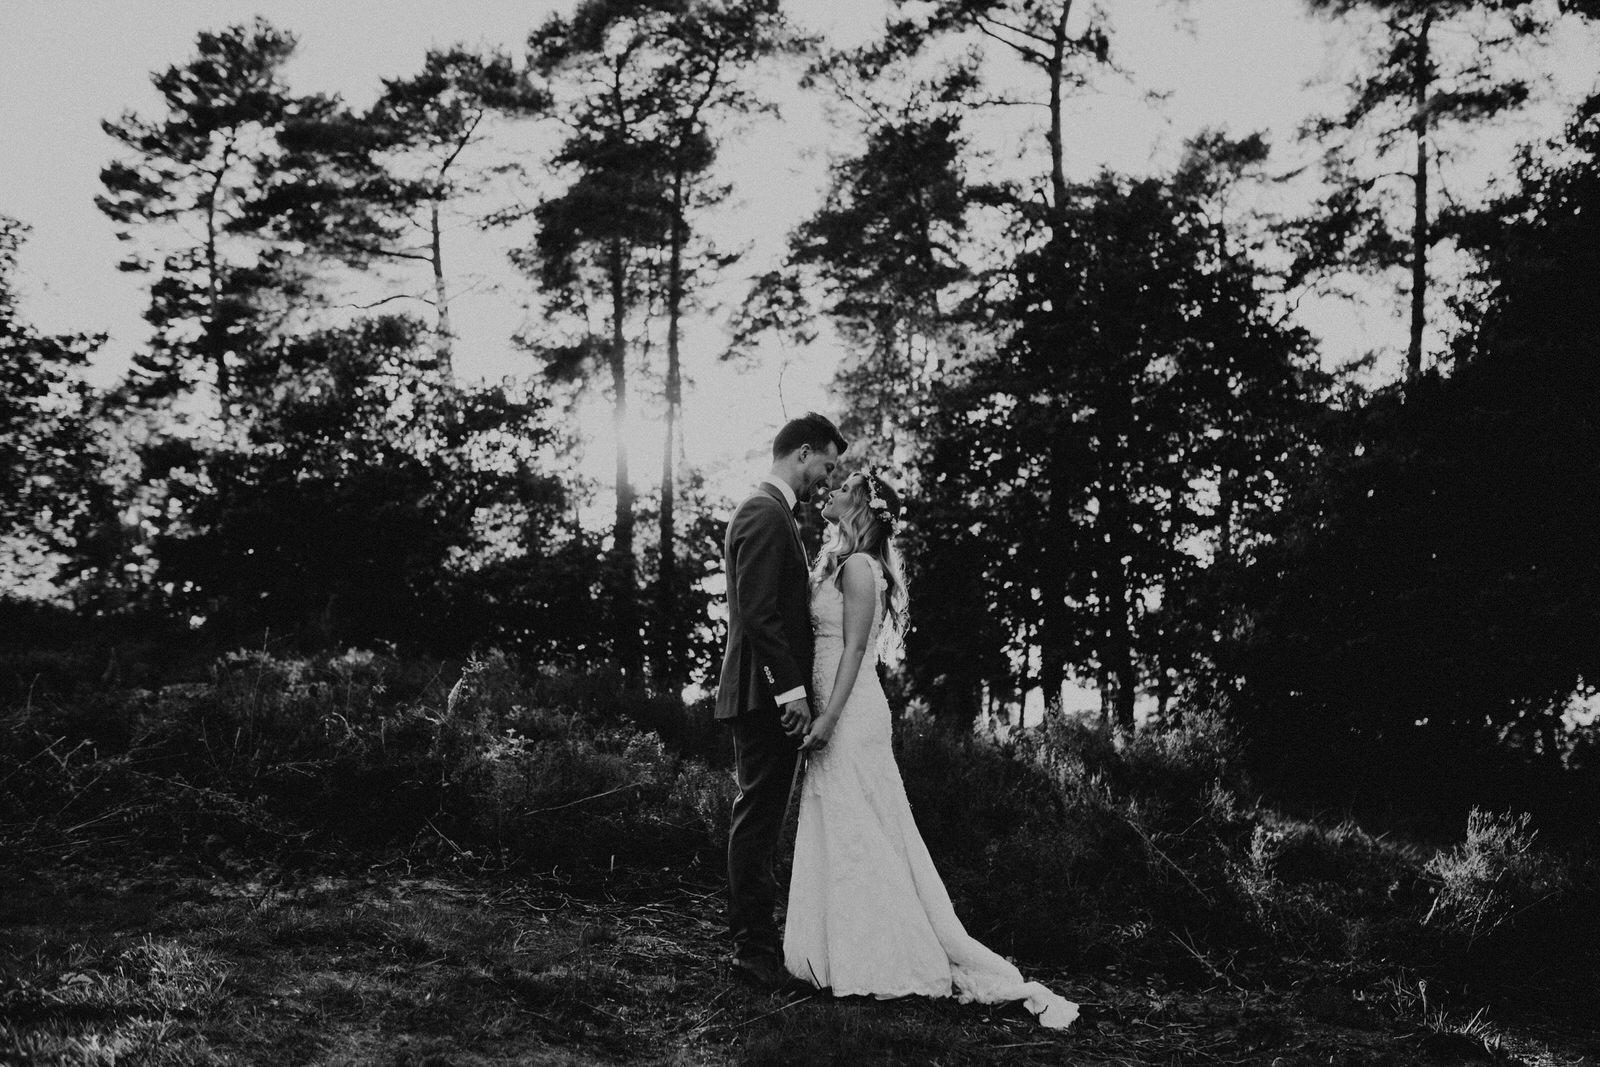 007Melle + Thomas After Wedding Shooting 5.5.18.jpg